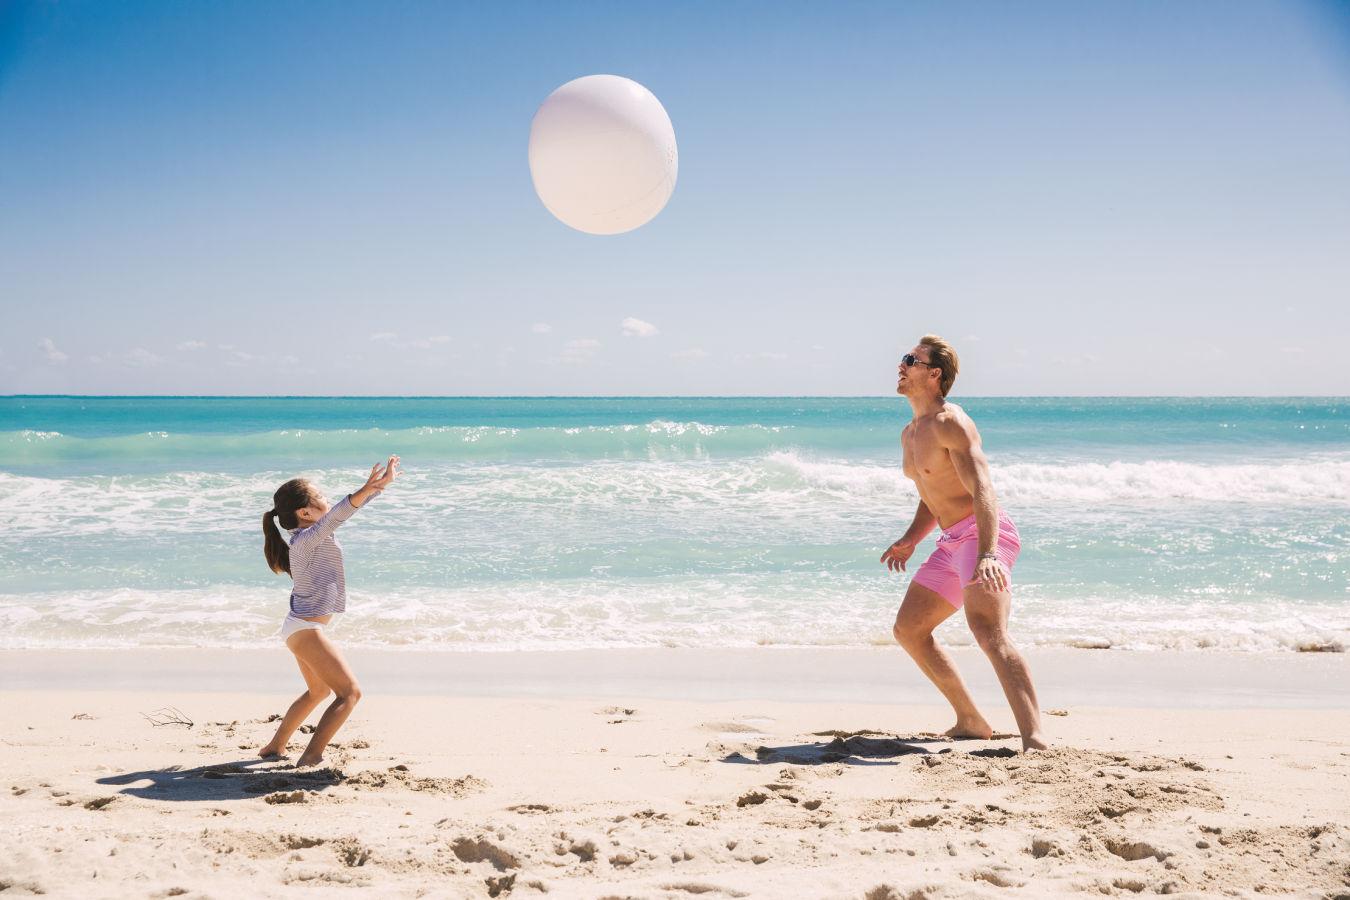 Beach ball action on the shoreline.